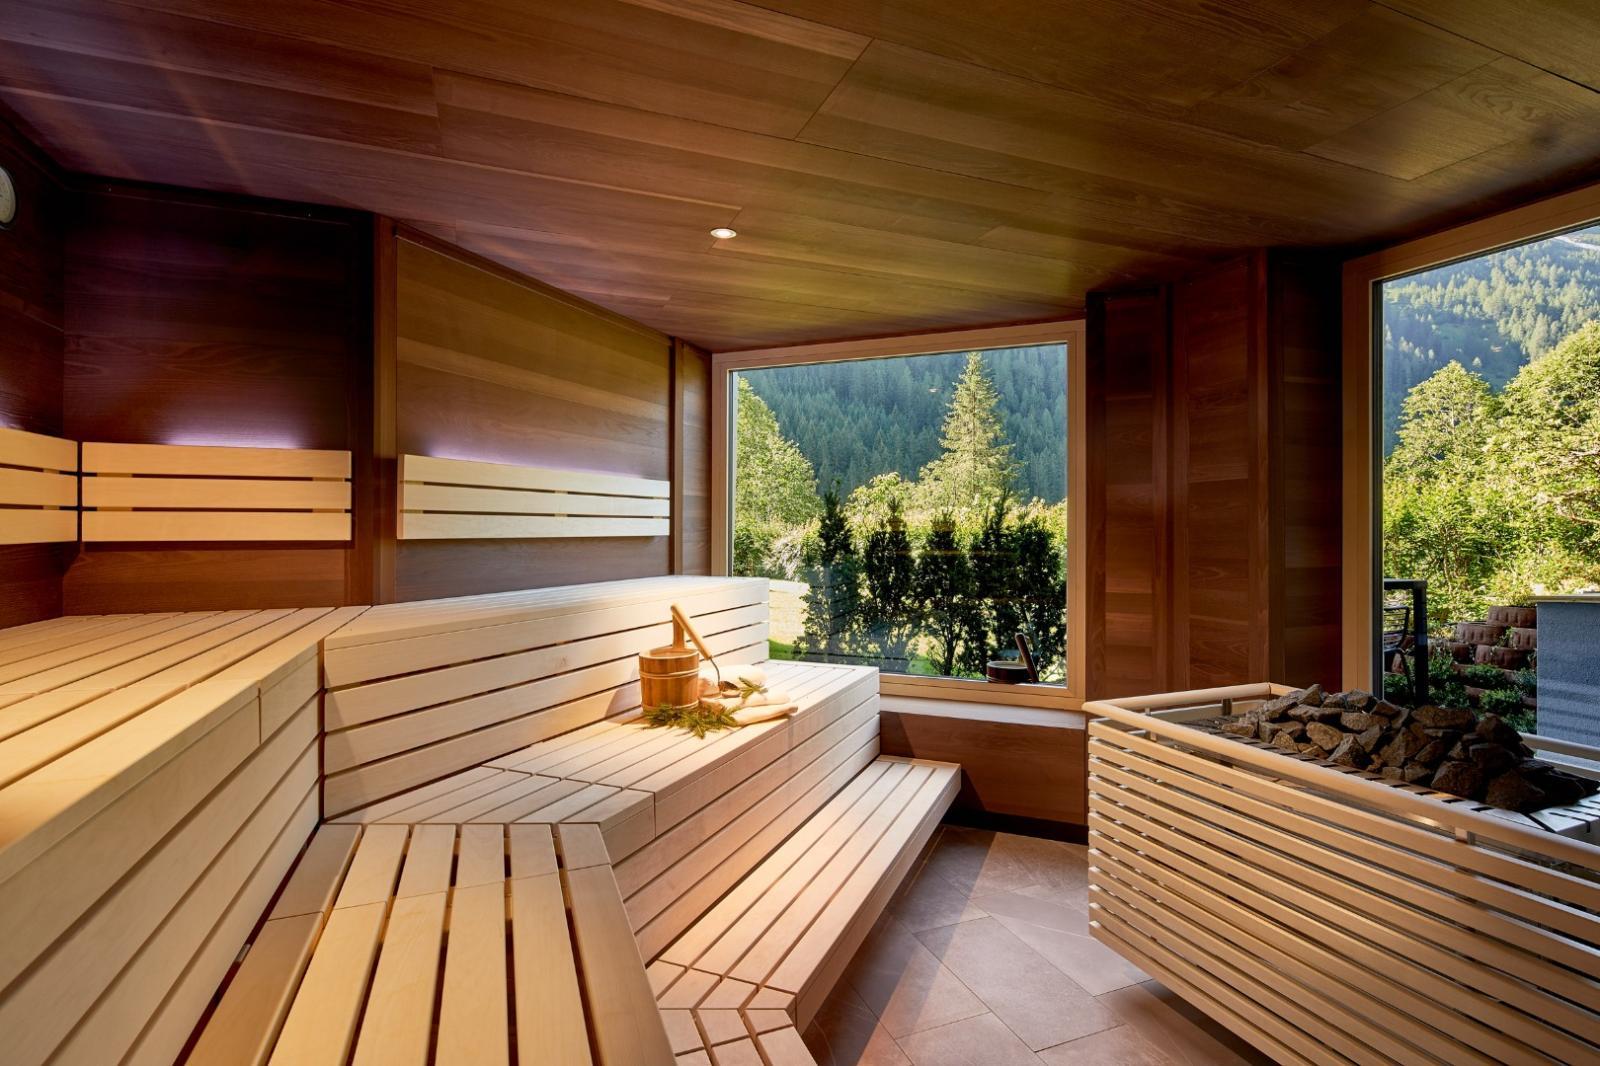 Aqua-Joggen: Foto vom Wellnesshotel Adler Inn - Tyrol Mountain Resort | Wellness Tirol